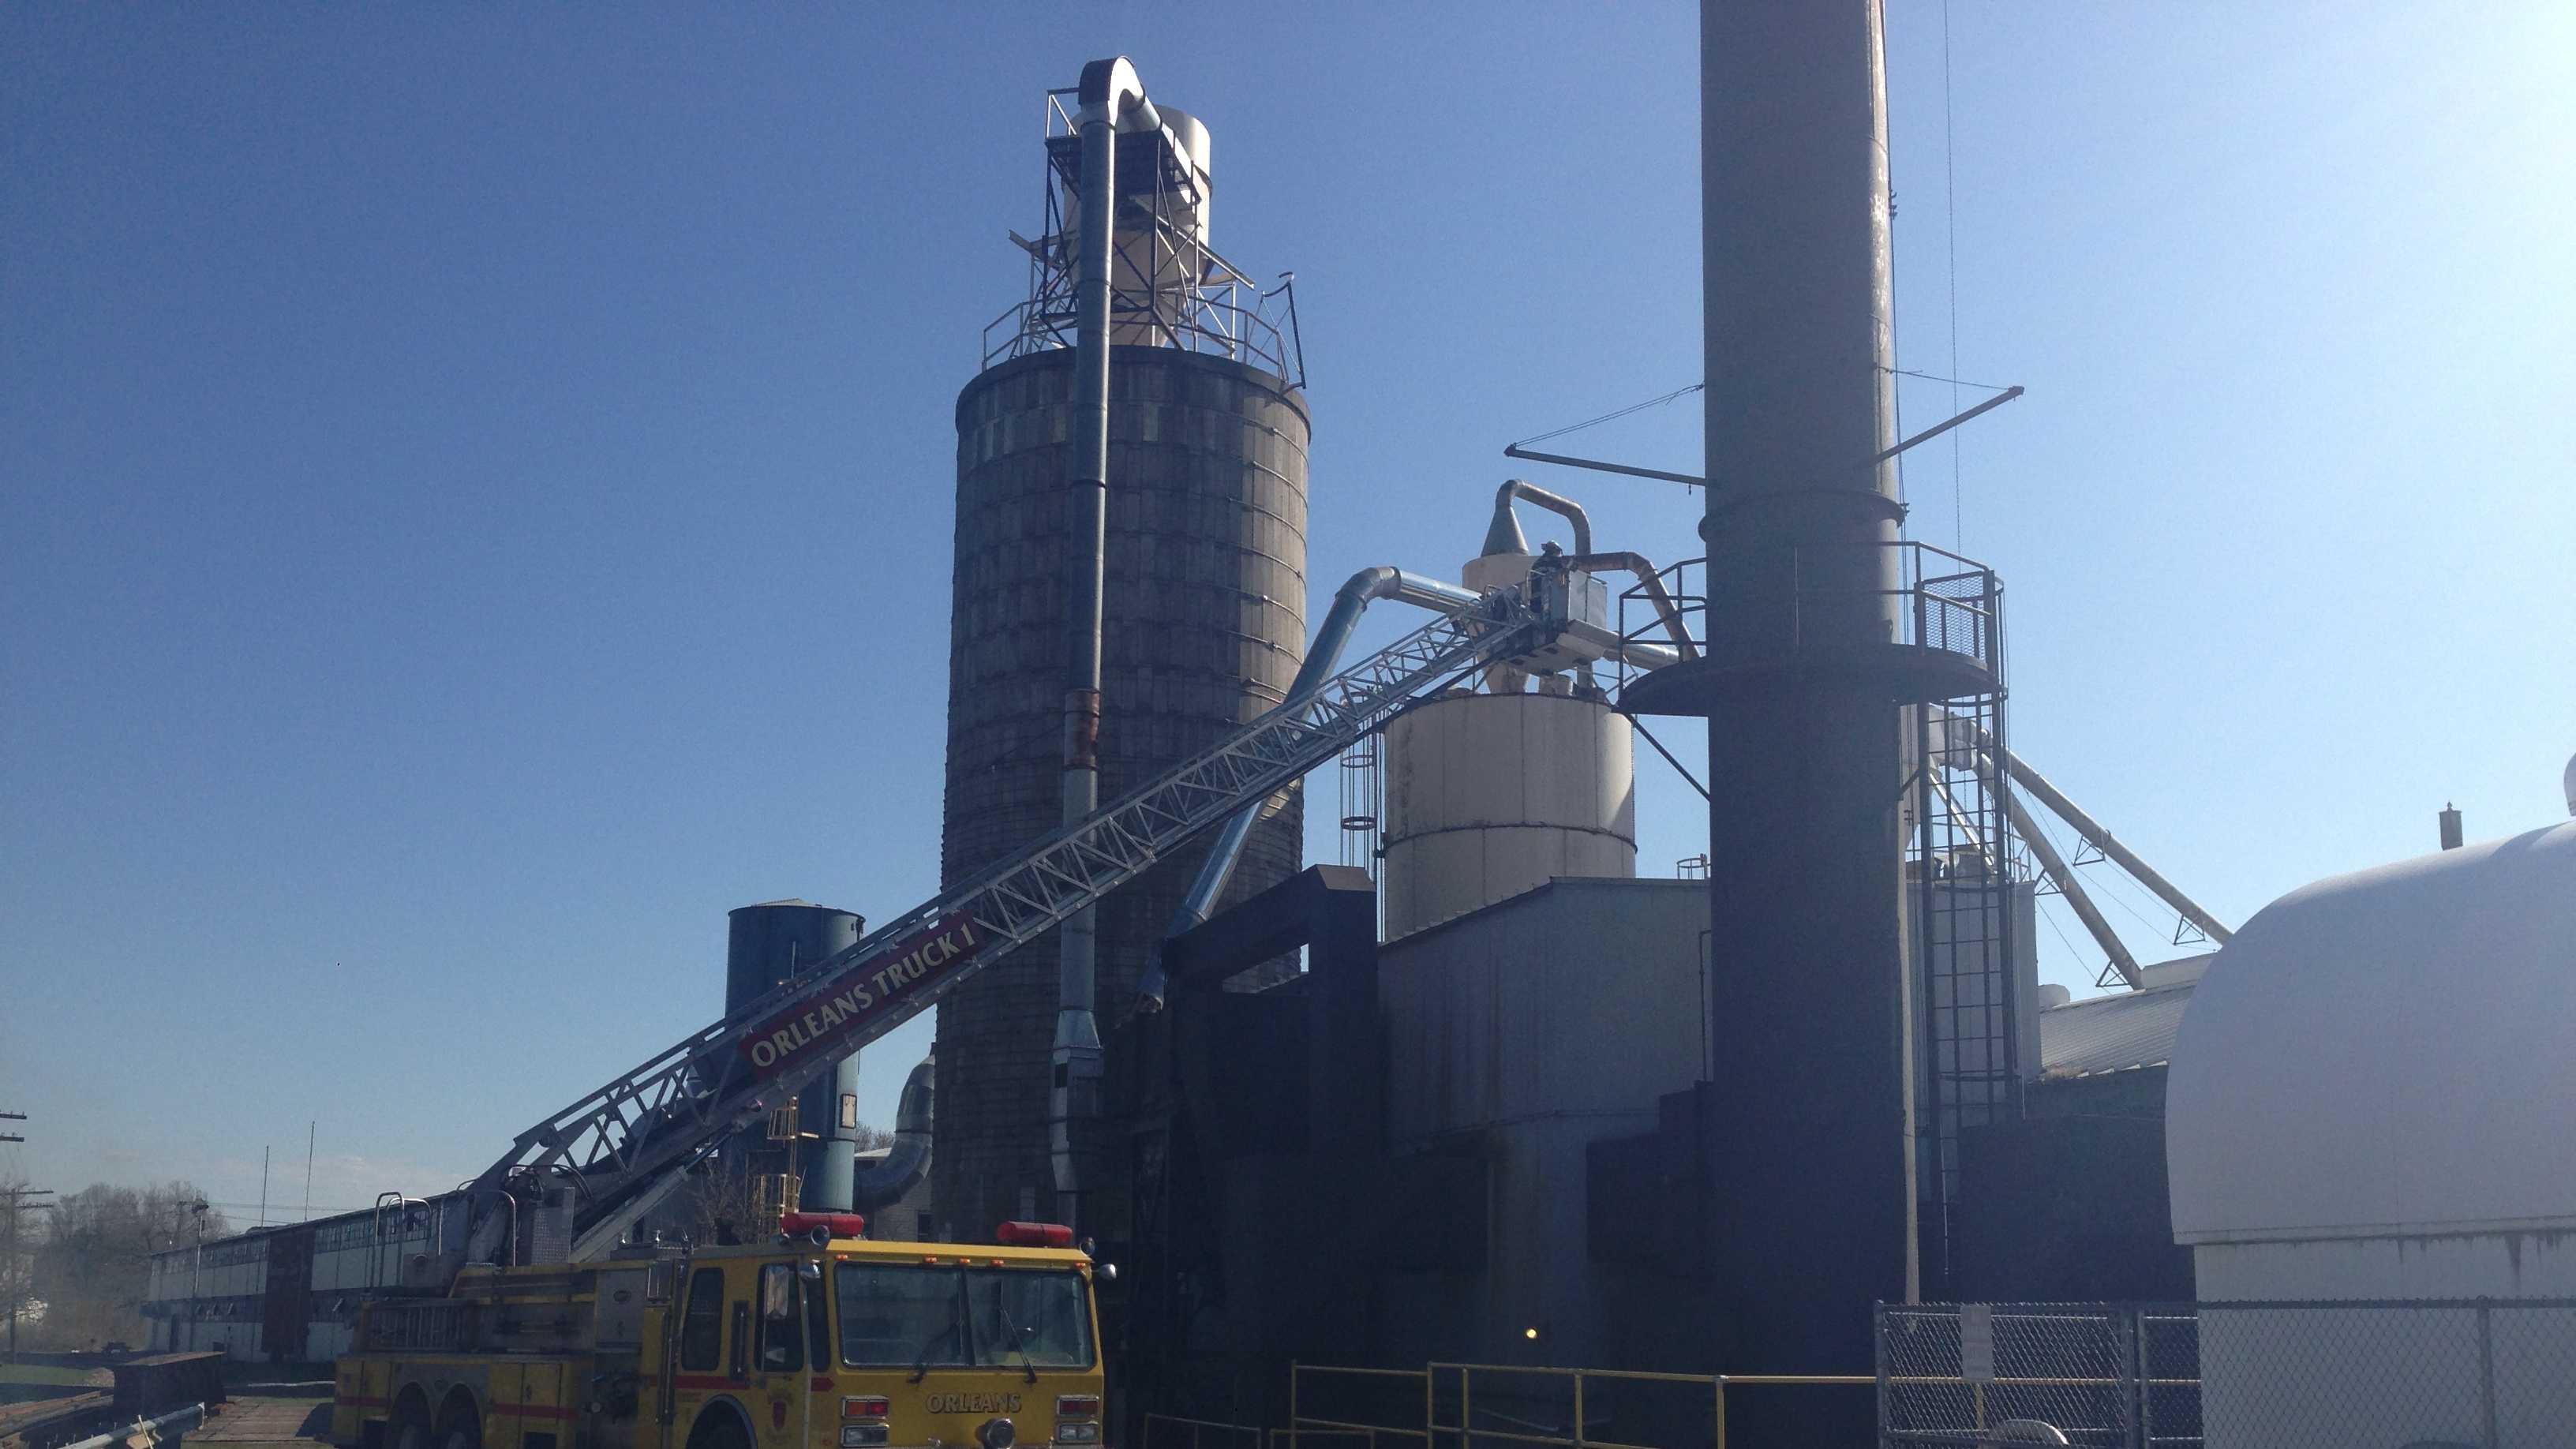 05-01-13 Fire erupts at Vt. furniture maker's sawdust silos - img